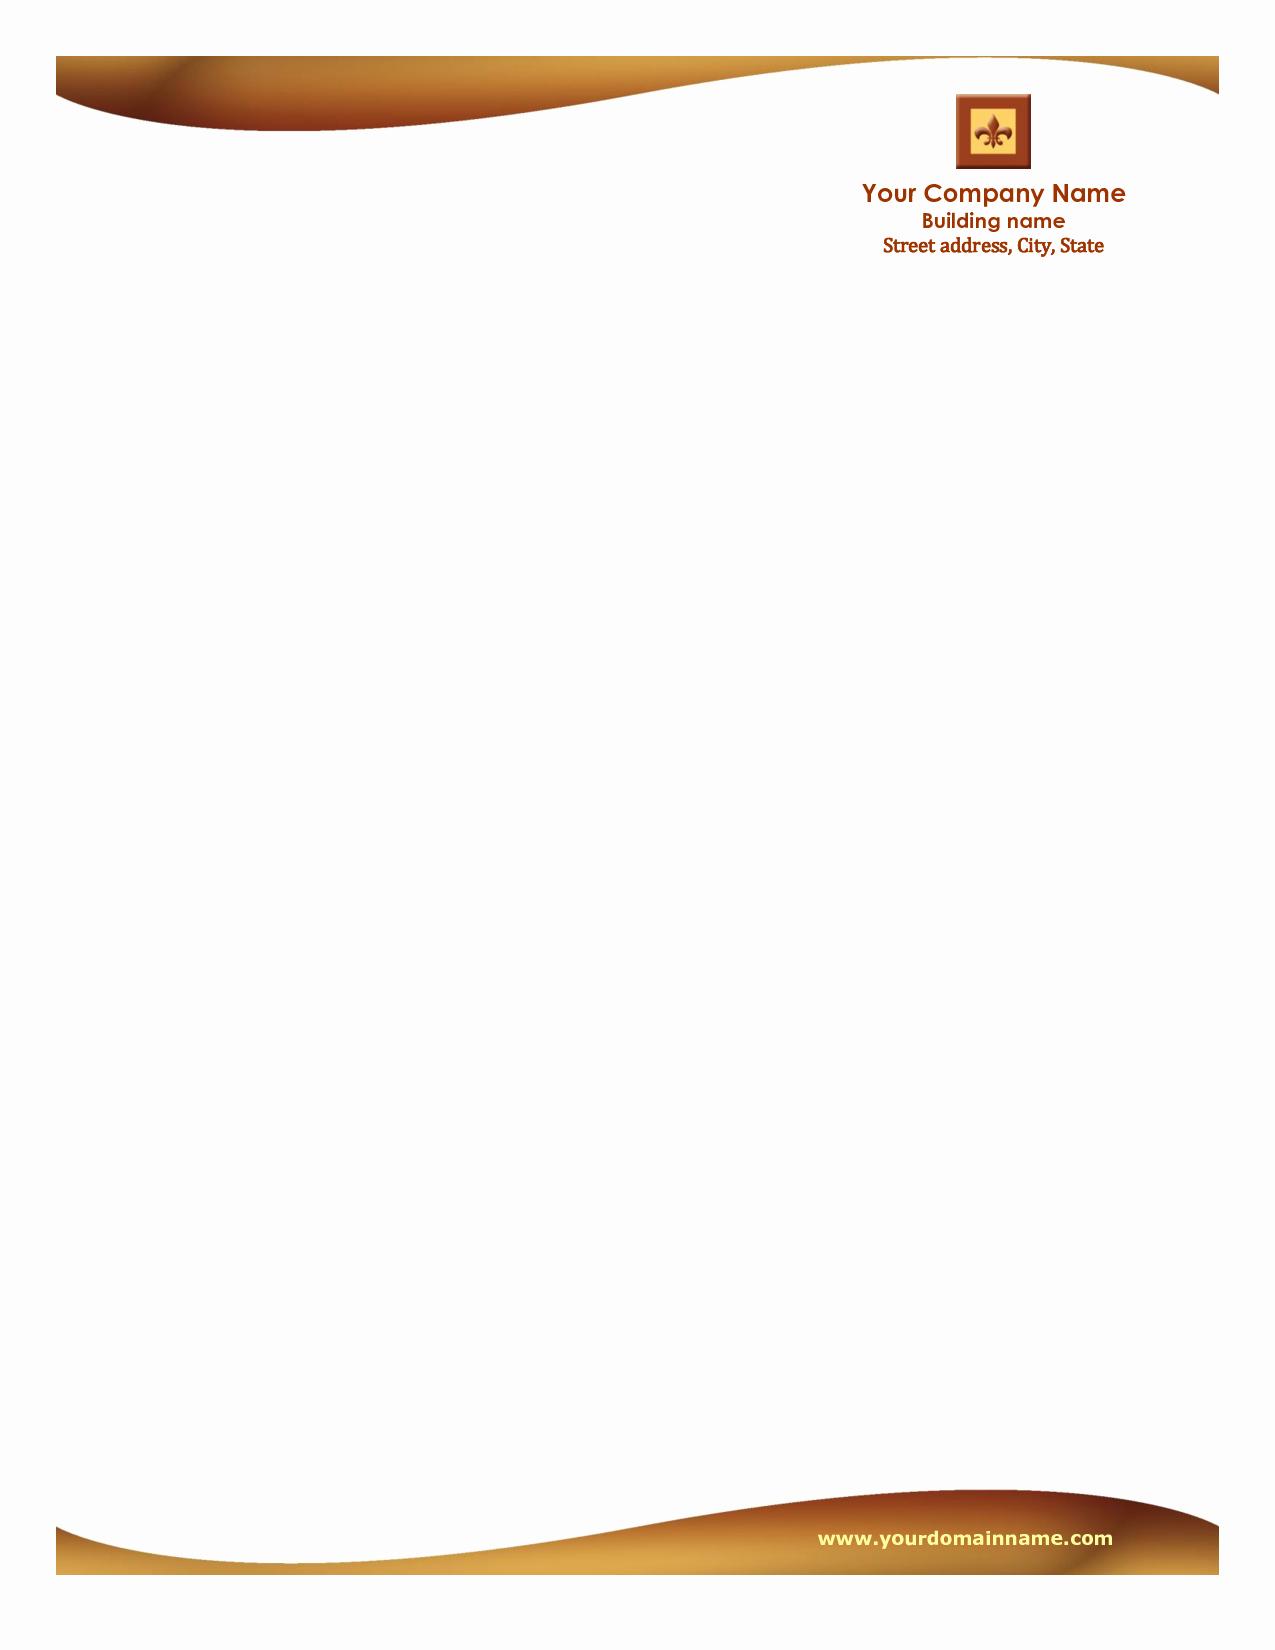 Professional Letterhead Template Free New Letterhead Templates Free